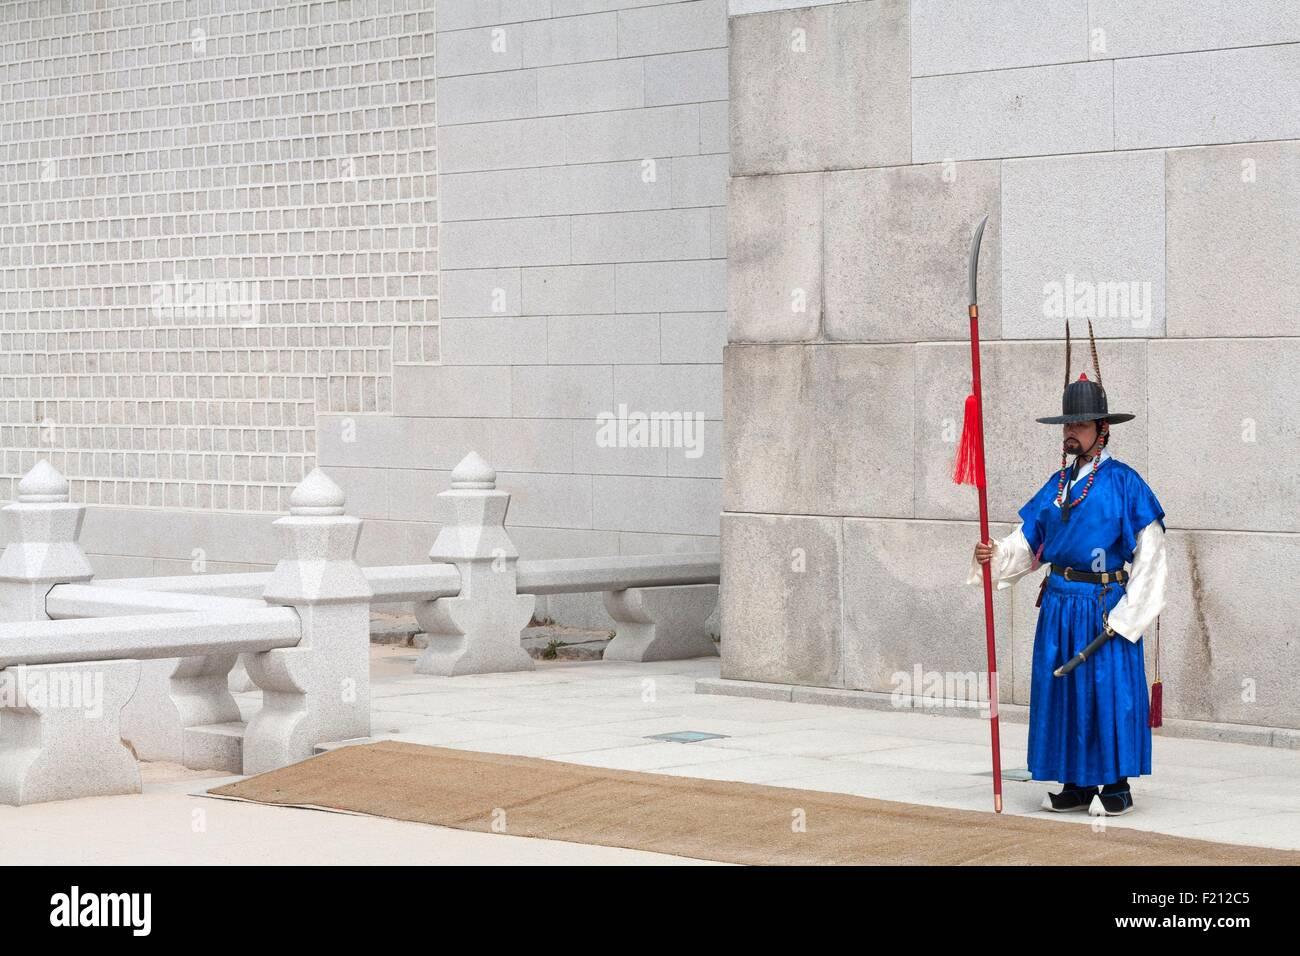 La Corée du Sud, Séoul, Jongno-gu, porte Gwanghwamun Gwanghwa Gyeongbokgung Palace Royal, Garde d Photo Stock